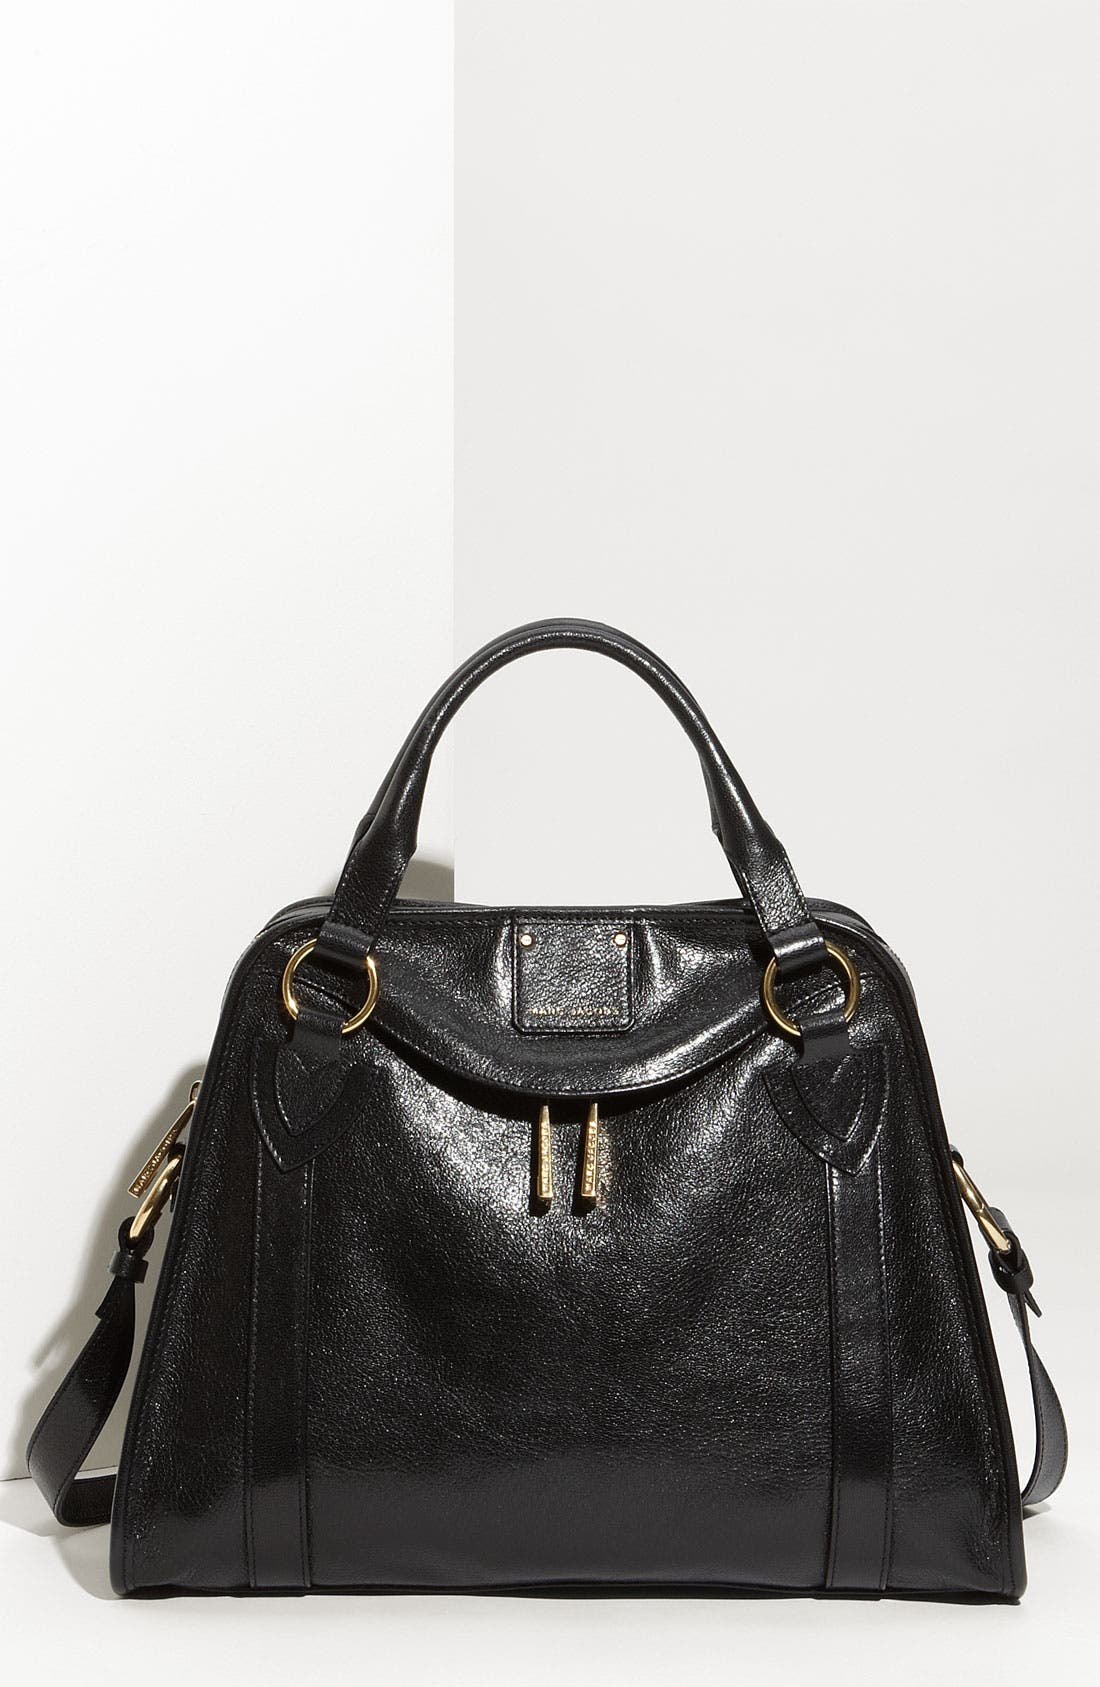 Main Image - MARC JACOBS 'Classic Wellington' Leather Satchel